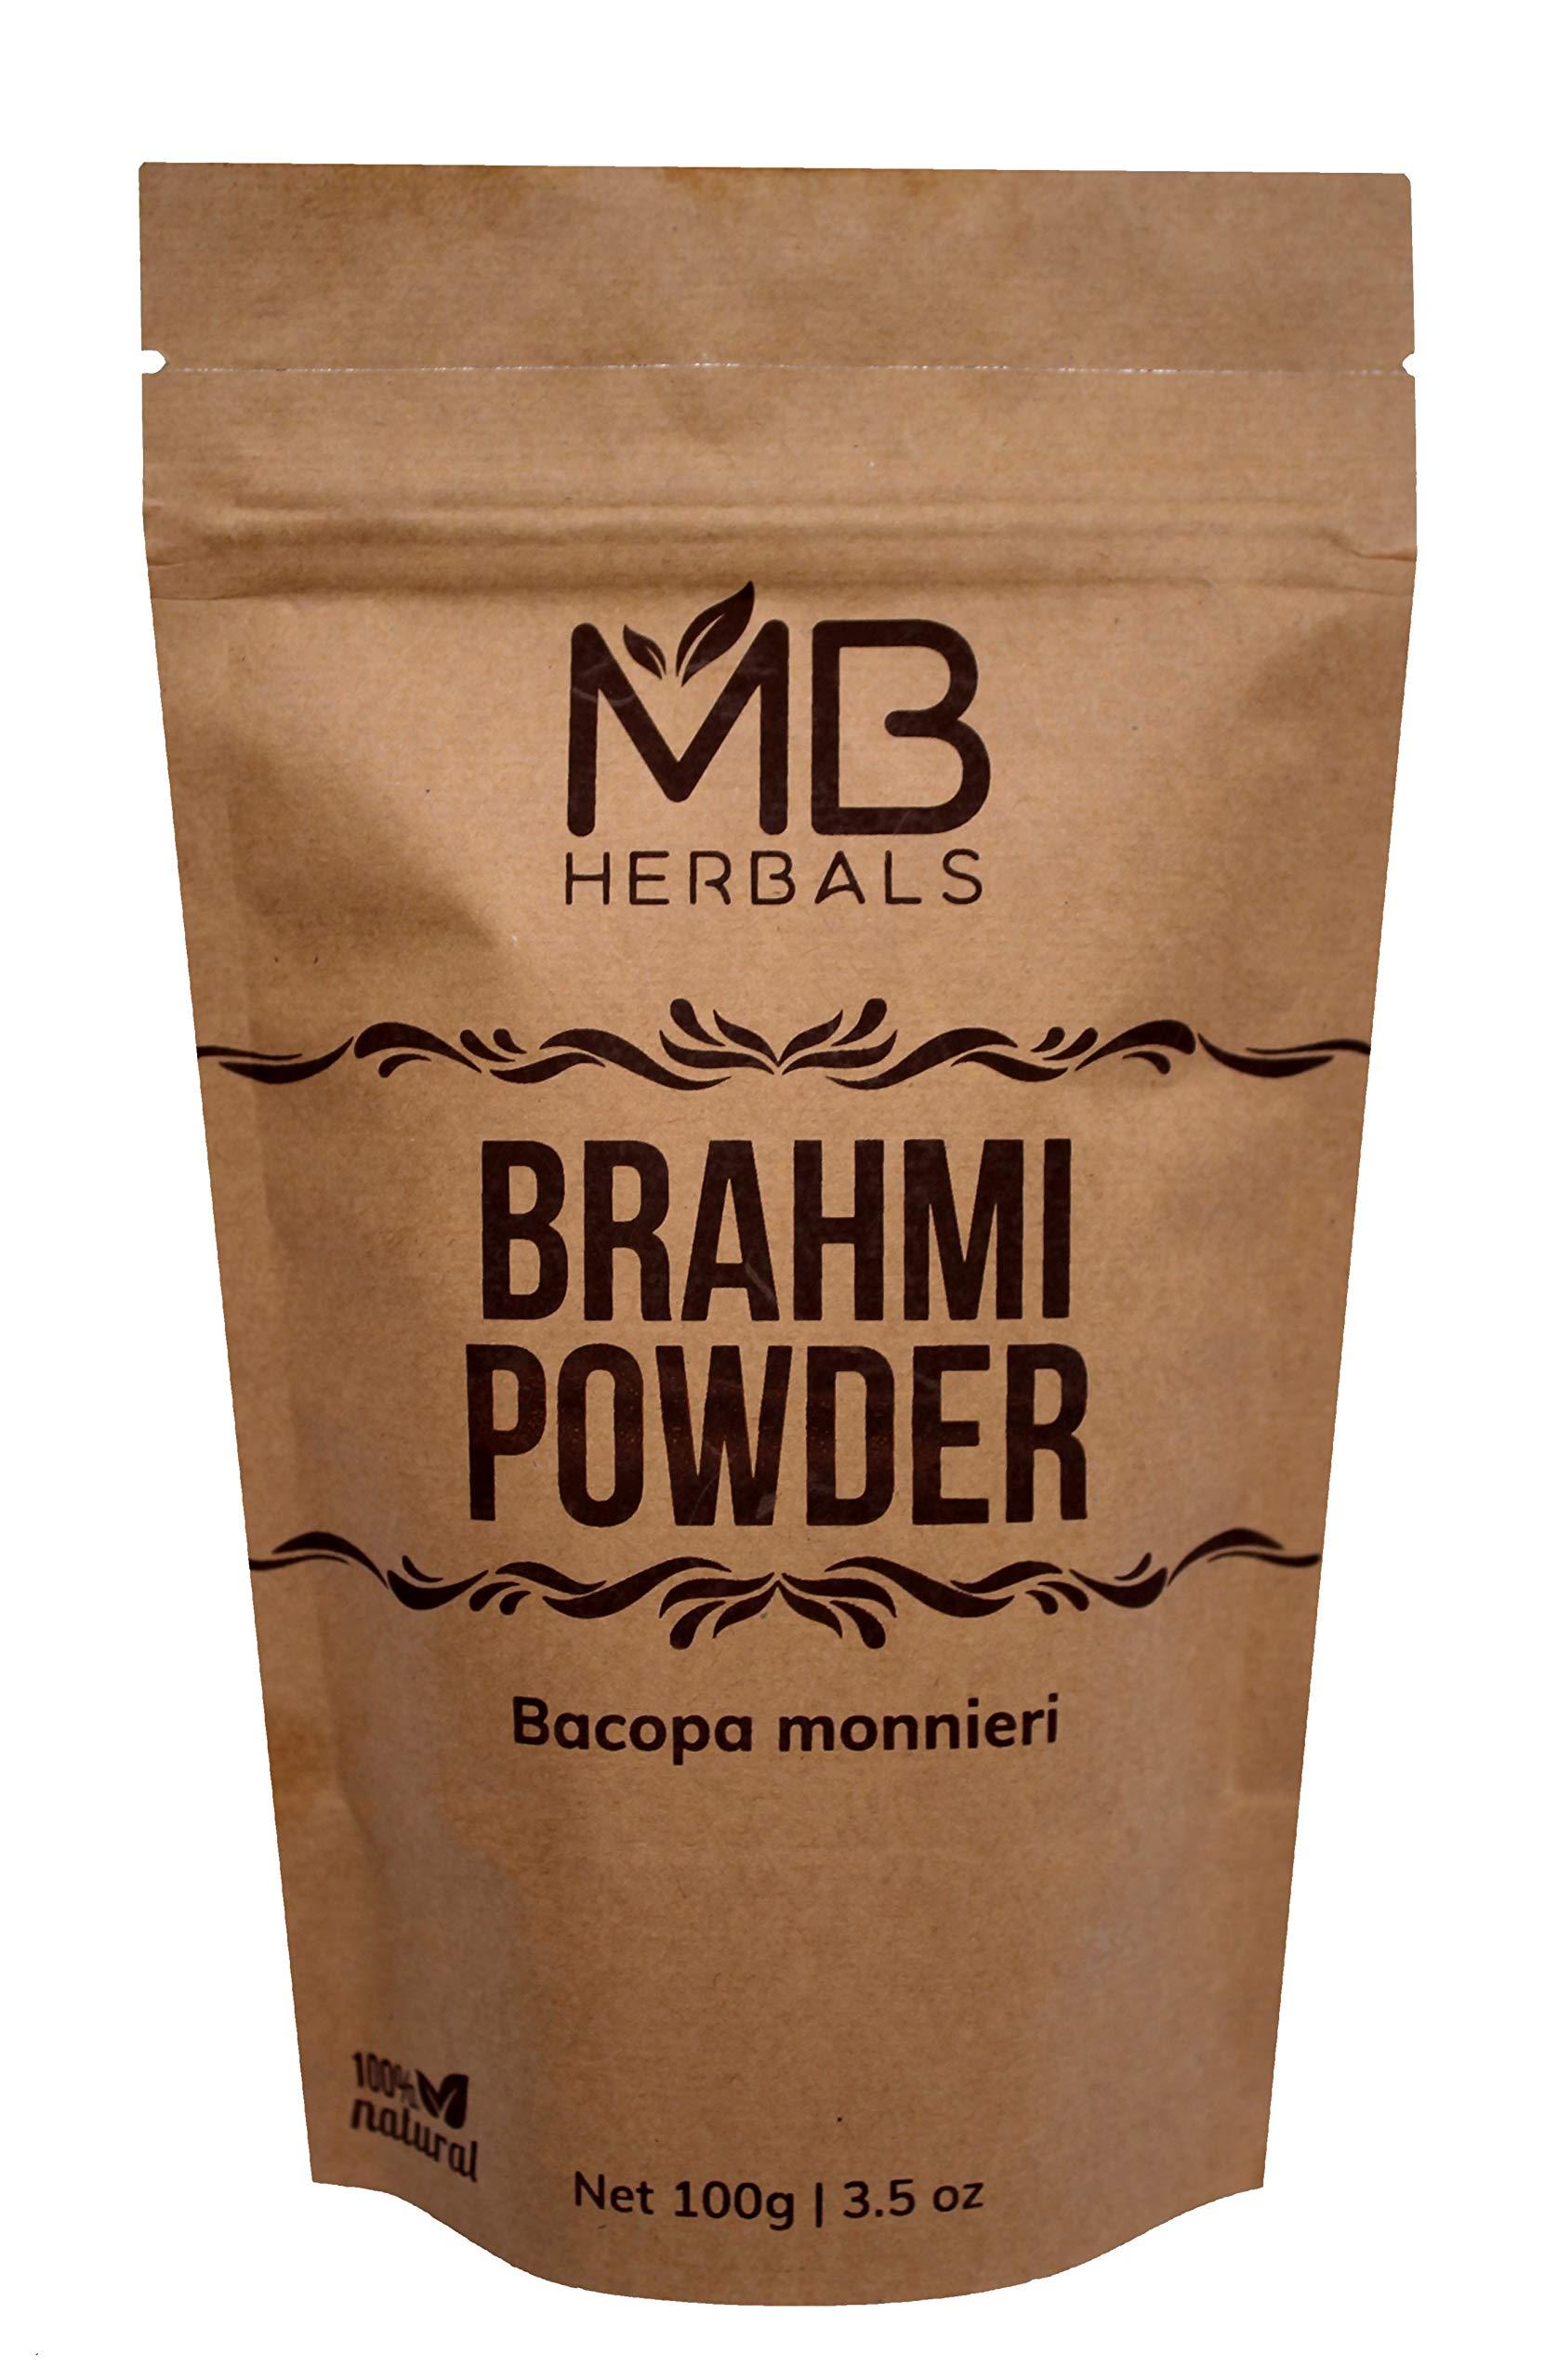 MB Herbals Pure Brahmi Powder 100g | 3.5 oz | 100% Pure Bacopa monnieri Powder | Promotes Hair Growth | Memory | Alertness